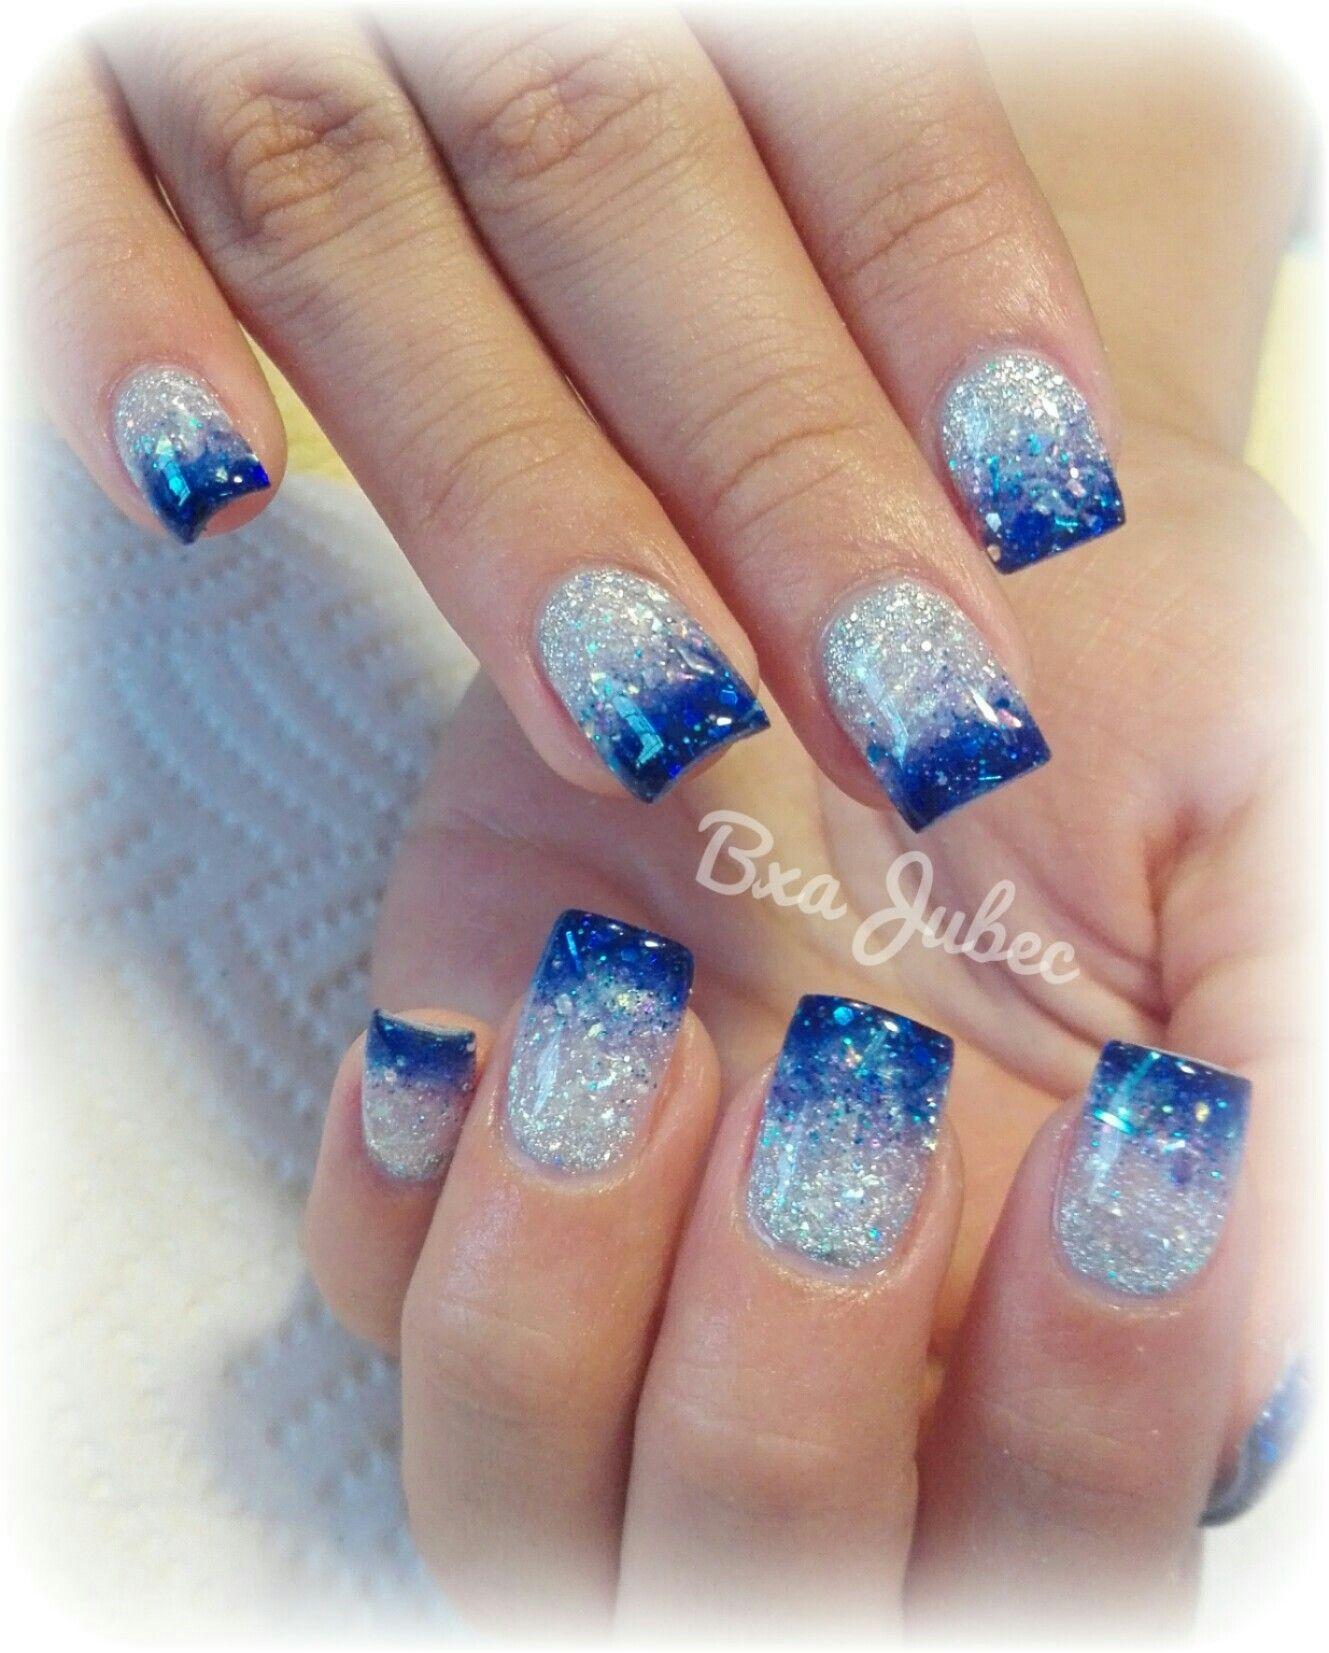 U as azul con plata u as pinterest u as azules - Unas azules decoradas ...